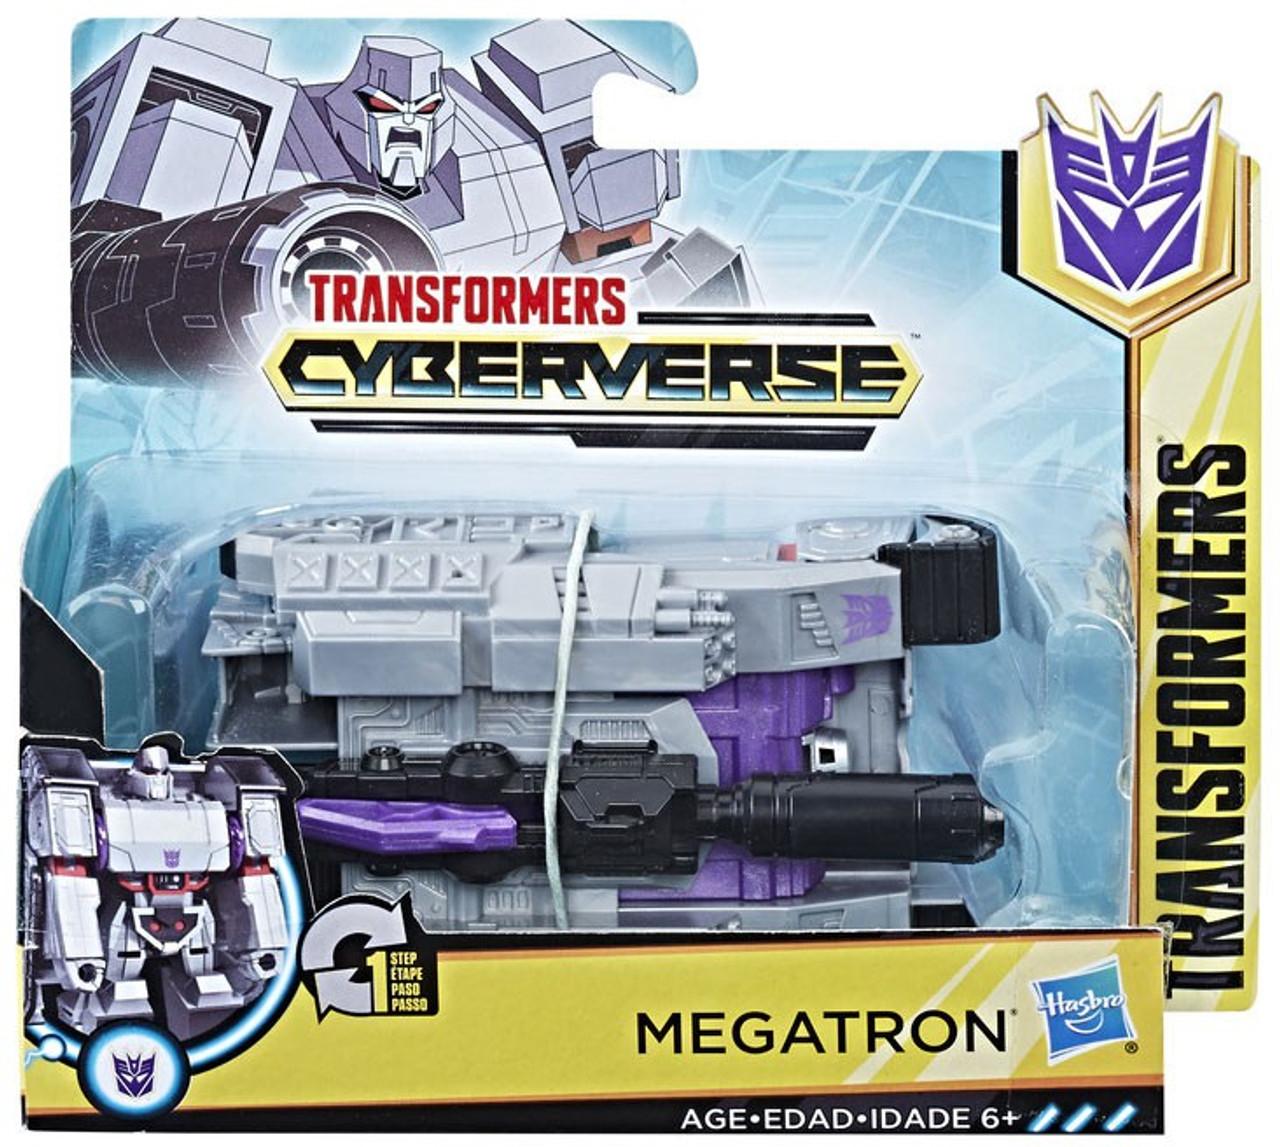 Hasbro Transformers Cyberverse Energon Axe Attack 1 Step Megatron in stock